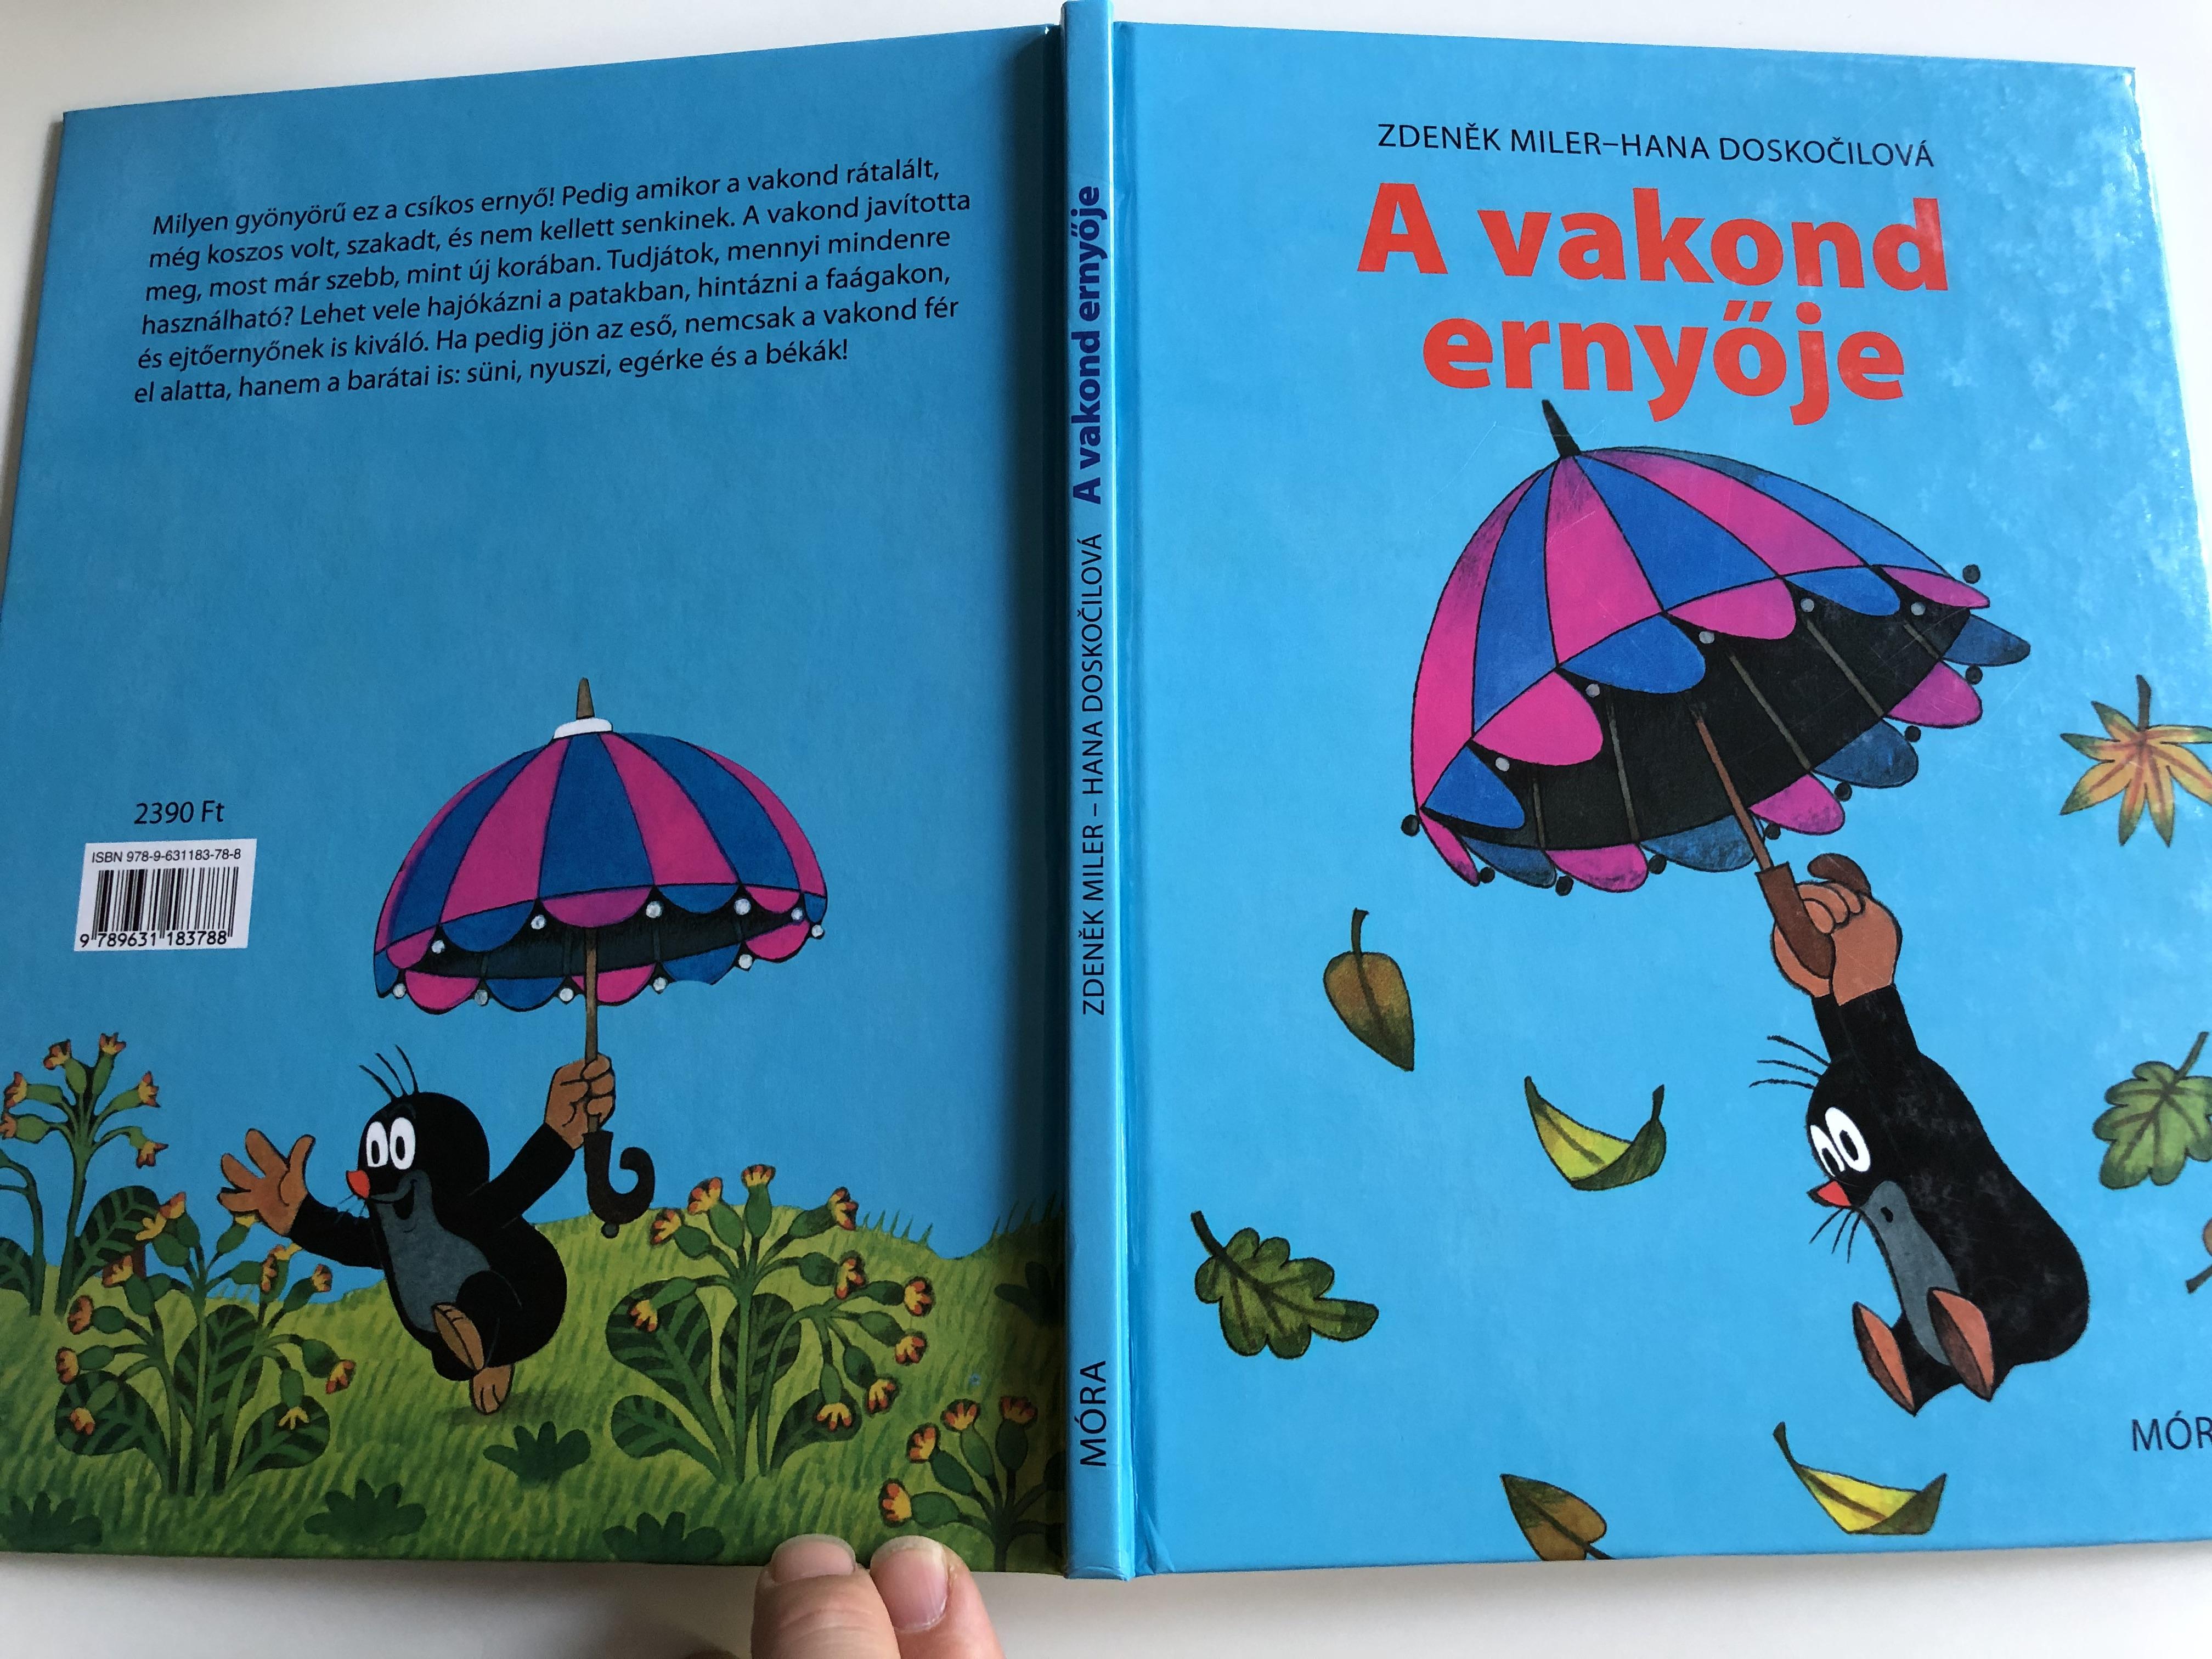 a-vakond-erny-je-by-zdenek-miler-hana-dosko-ilov-hungarian-translation-of-m-ra-k-nyvkiad-2007-13-.jpg